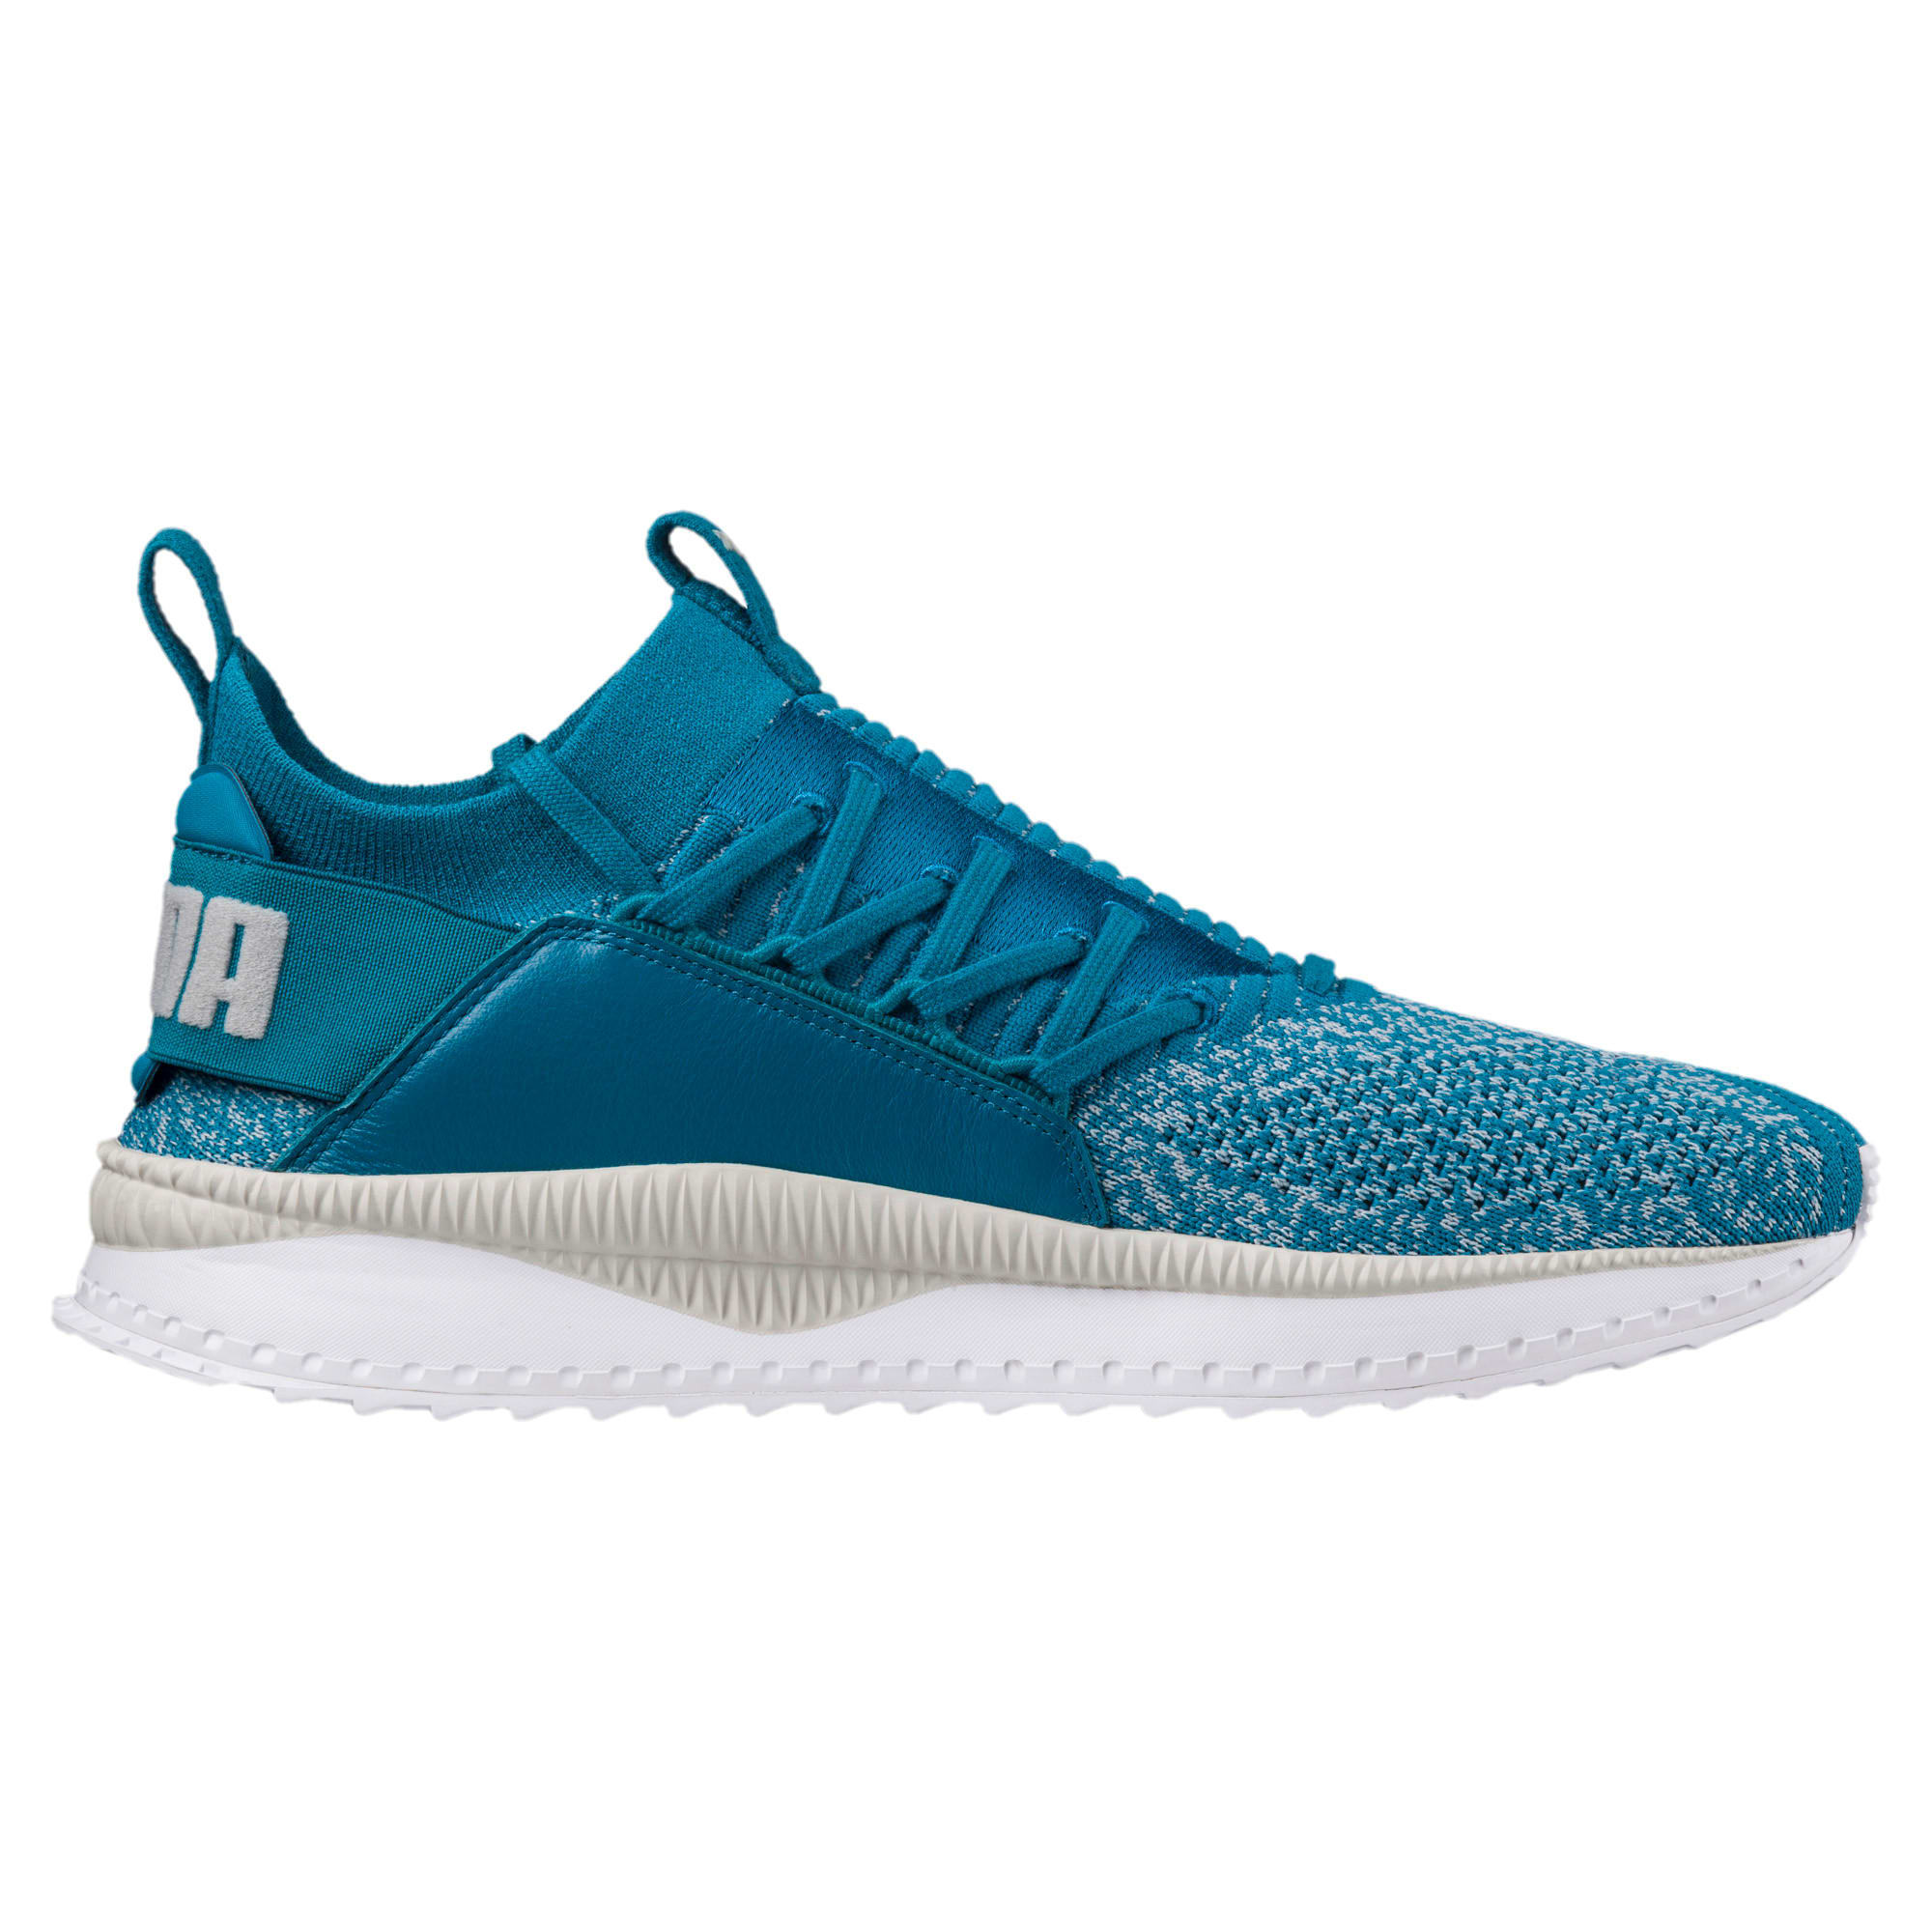 Thumbnail 3 of TSUGI Jun Sneakers, Ocean Depths-GViolet-PWhite, medium